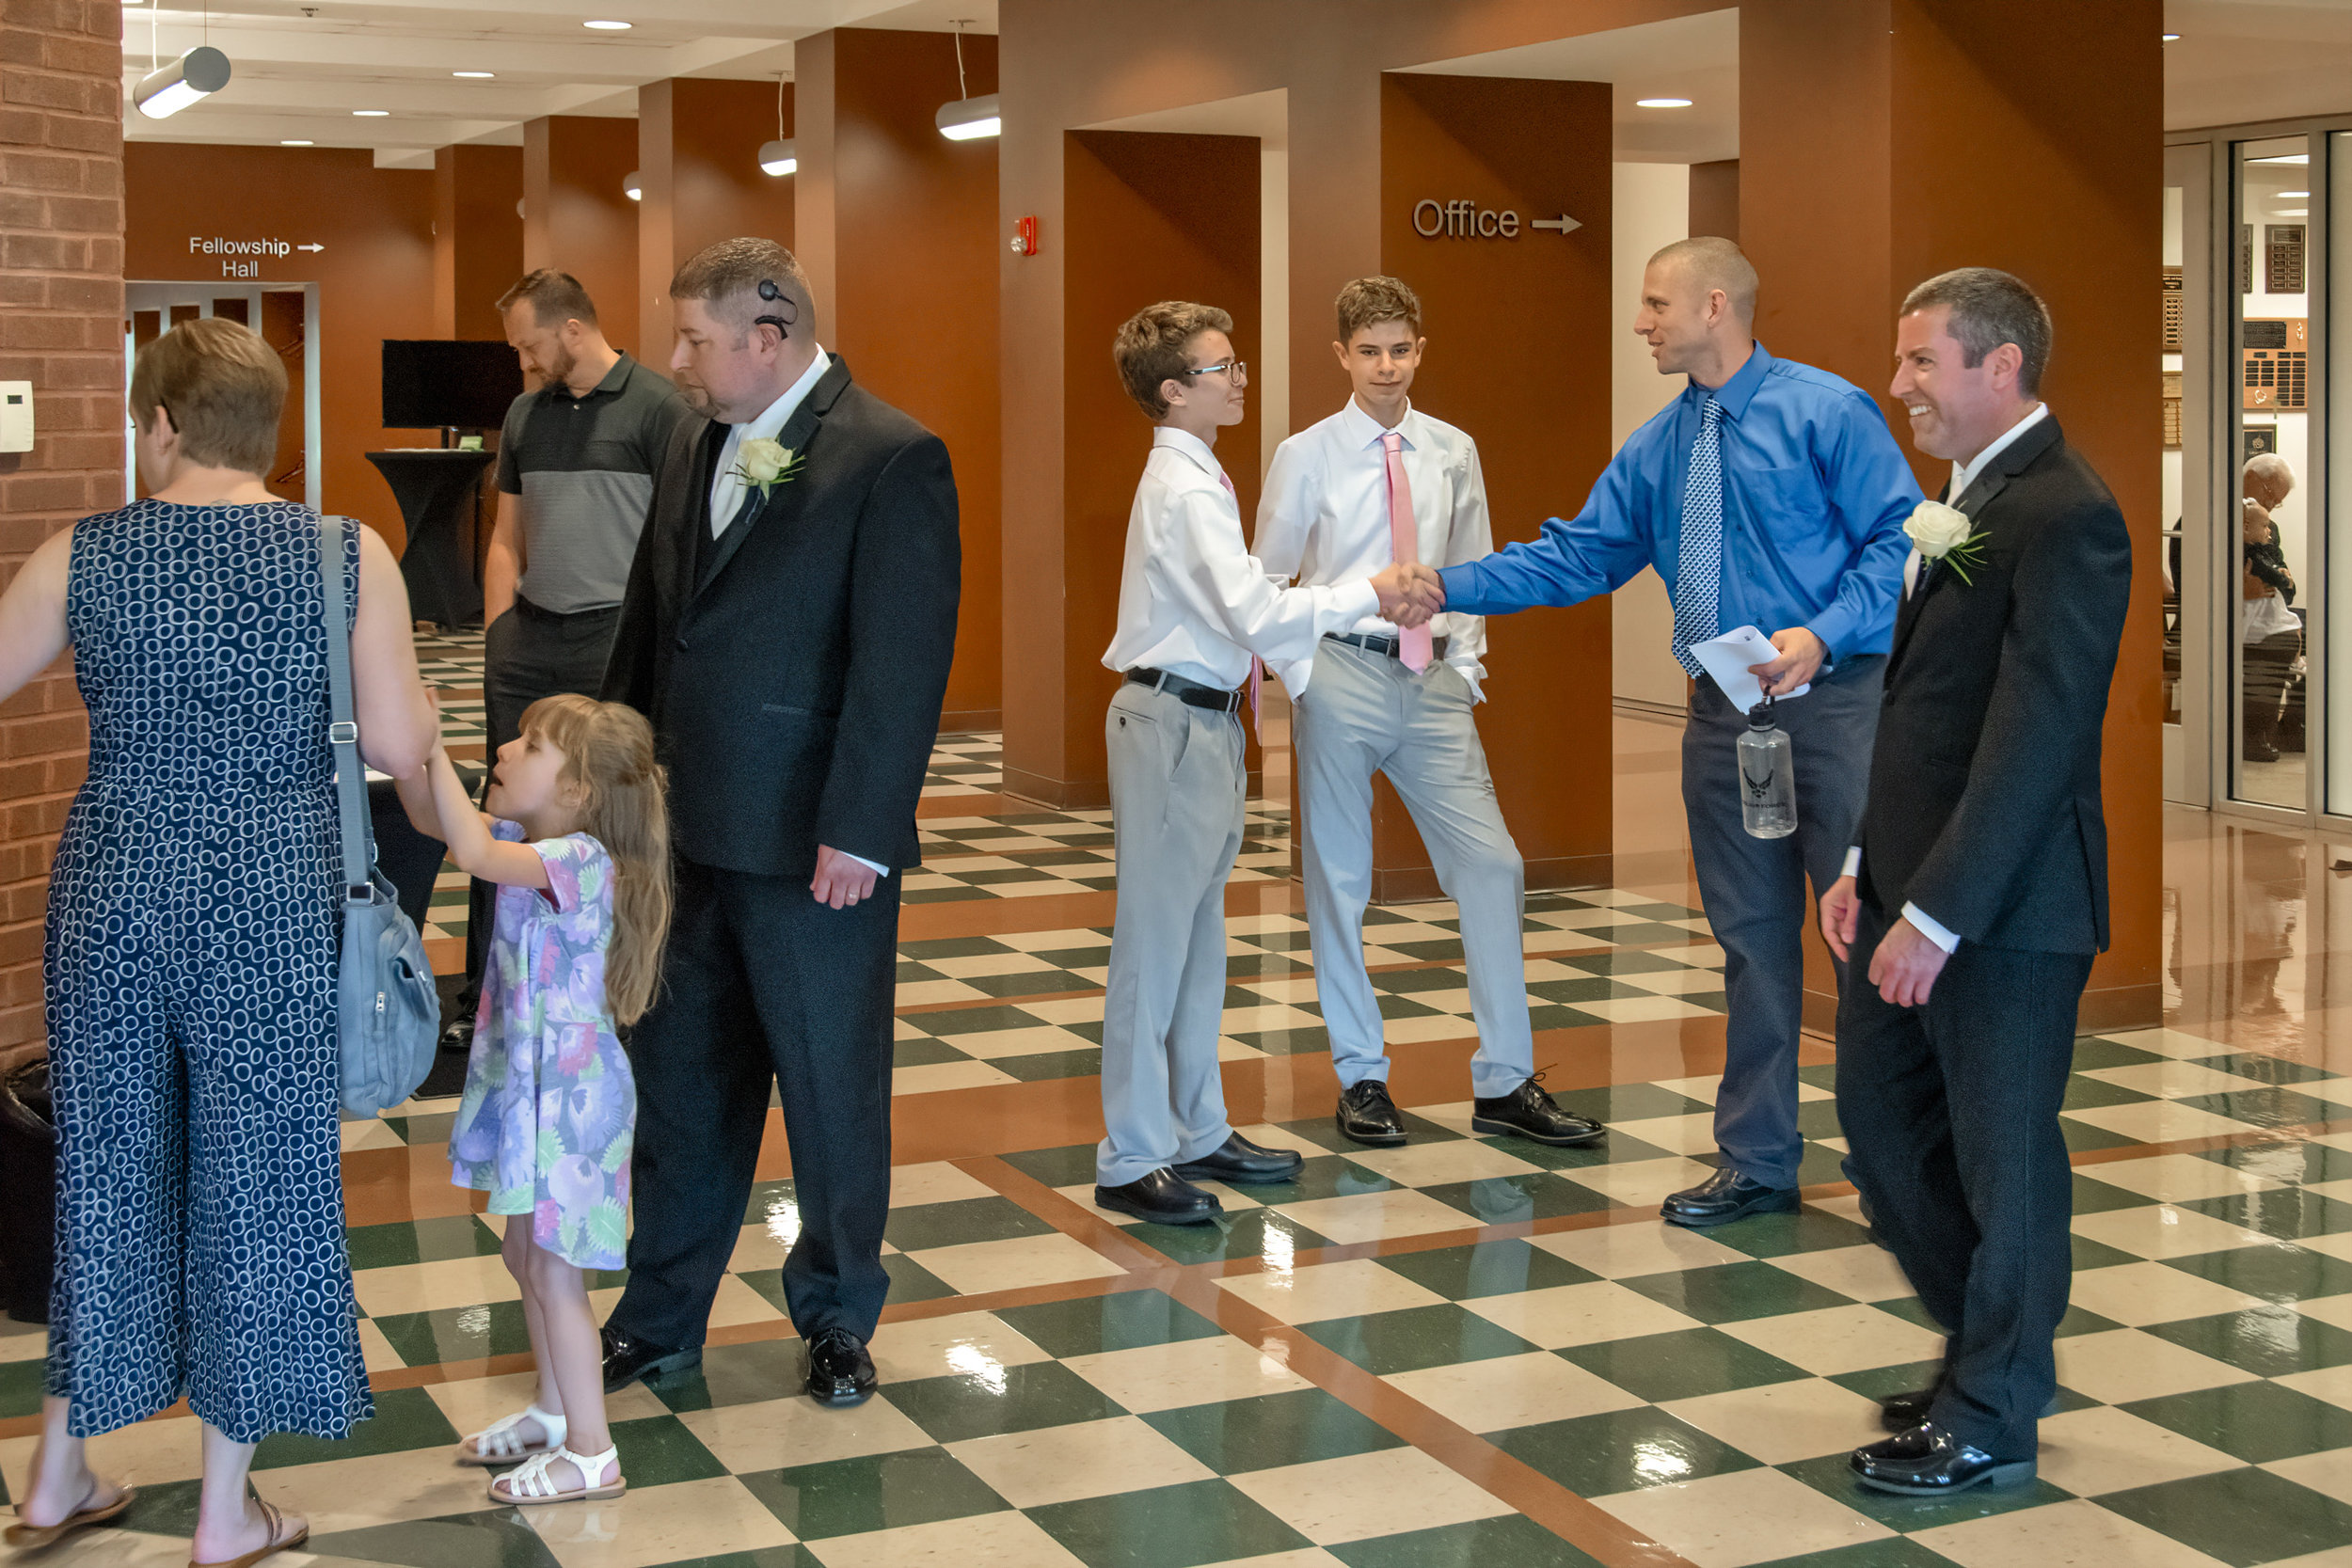 Meeting New Family Members